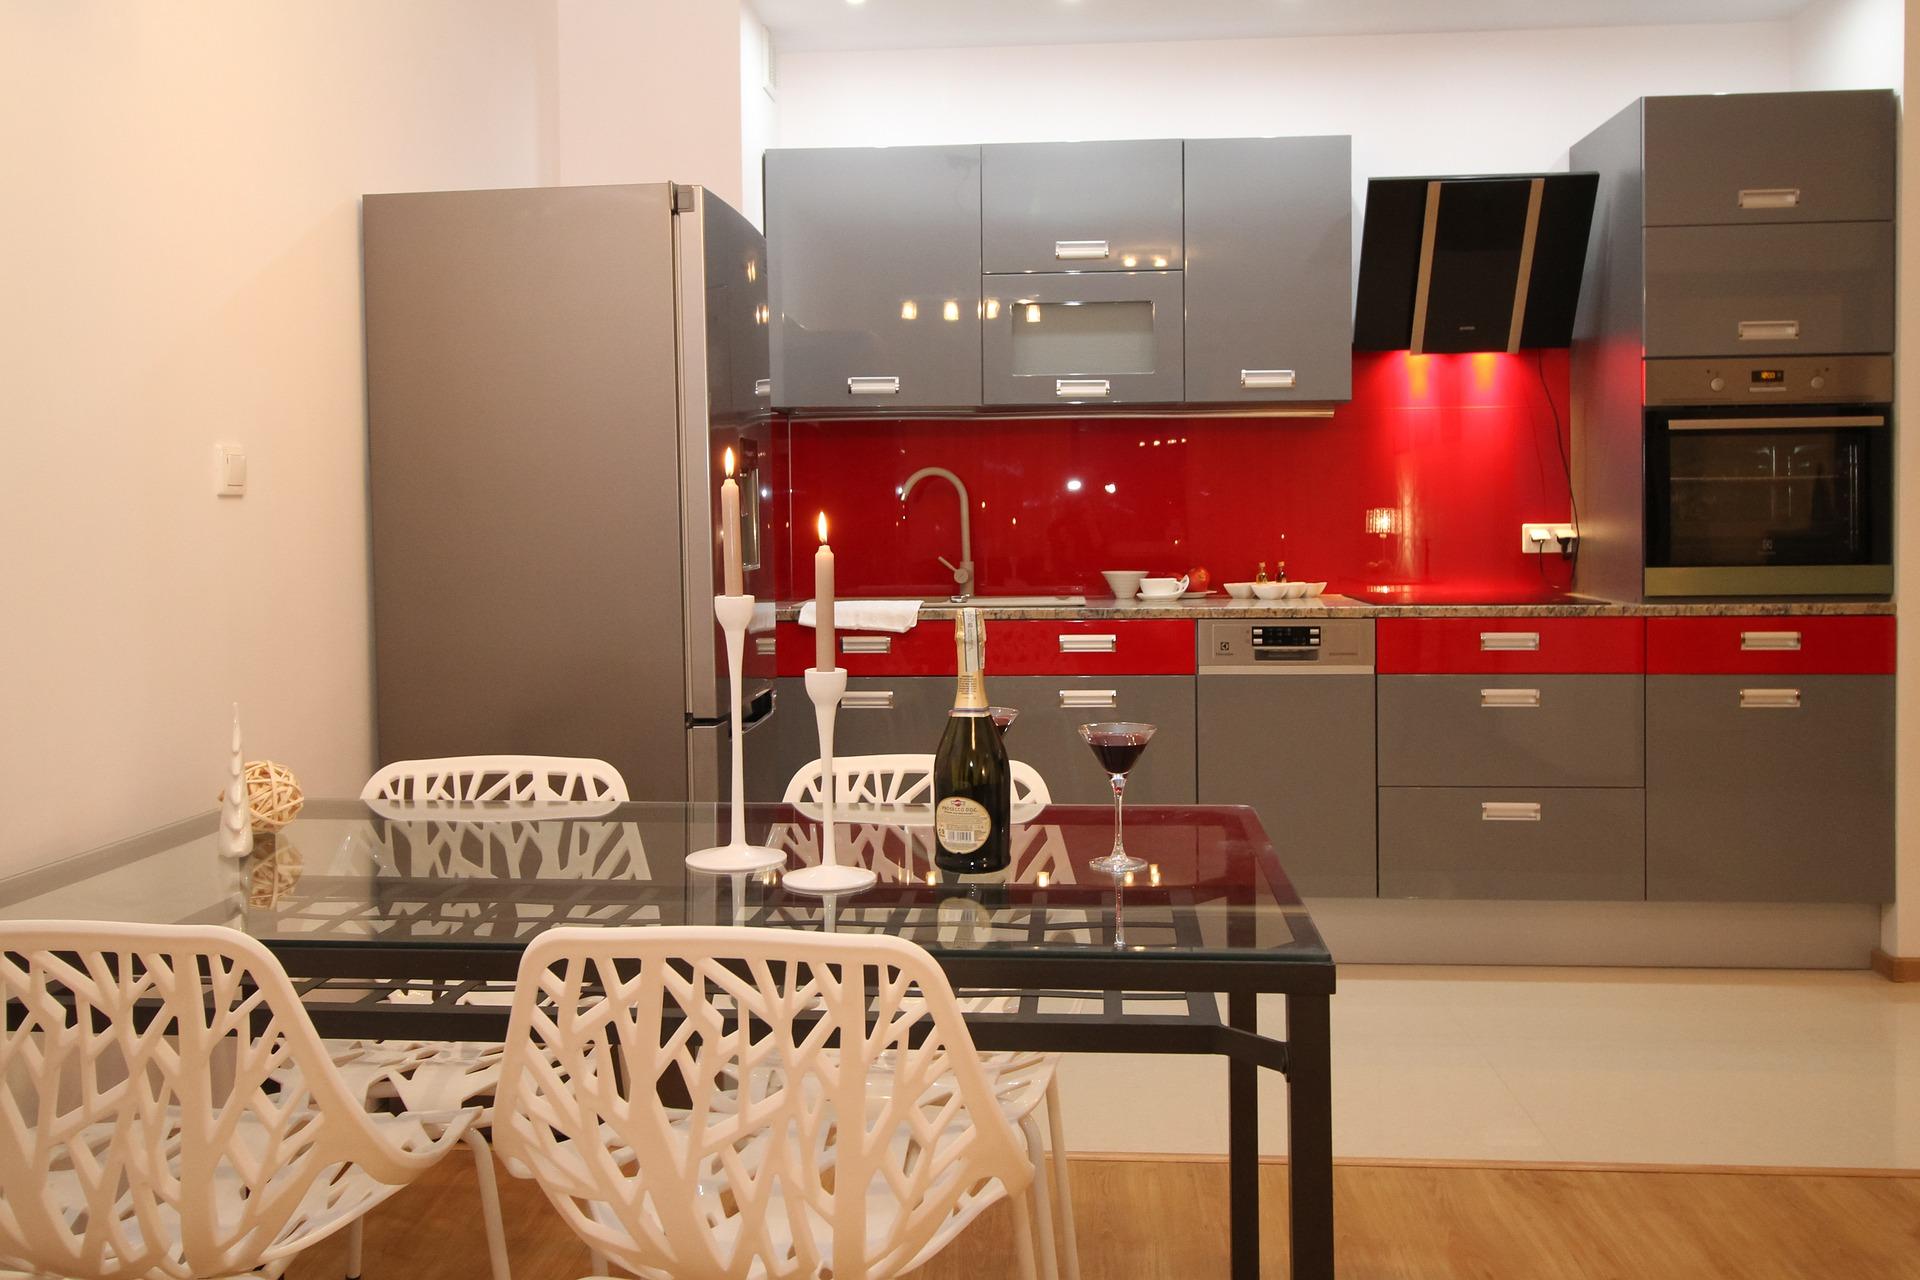 A red kitchen